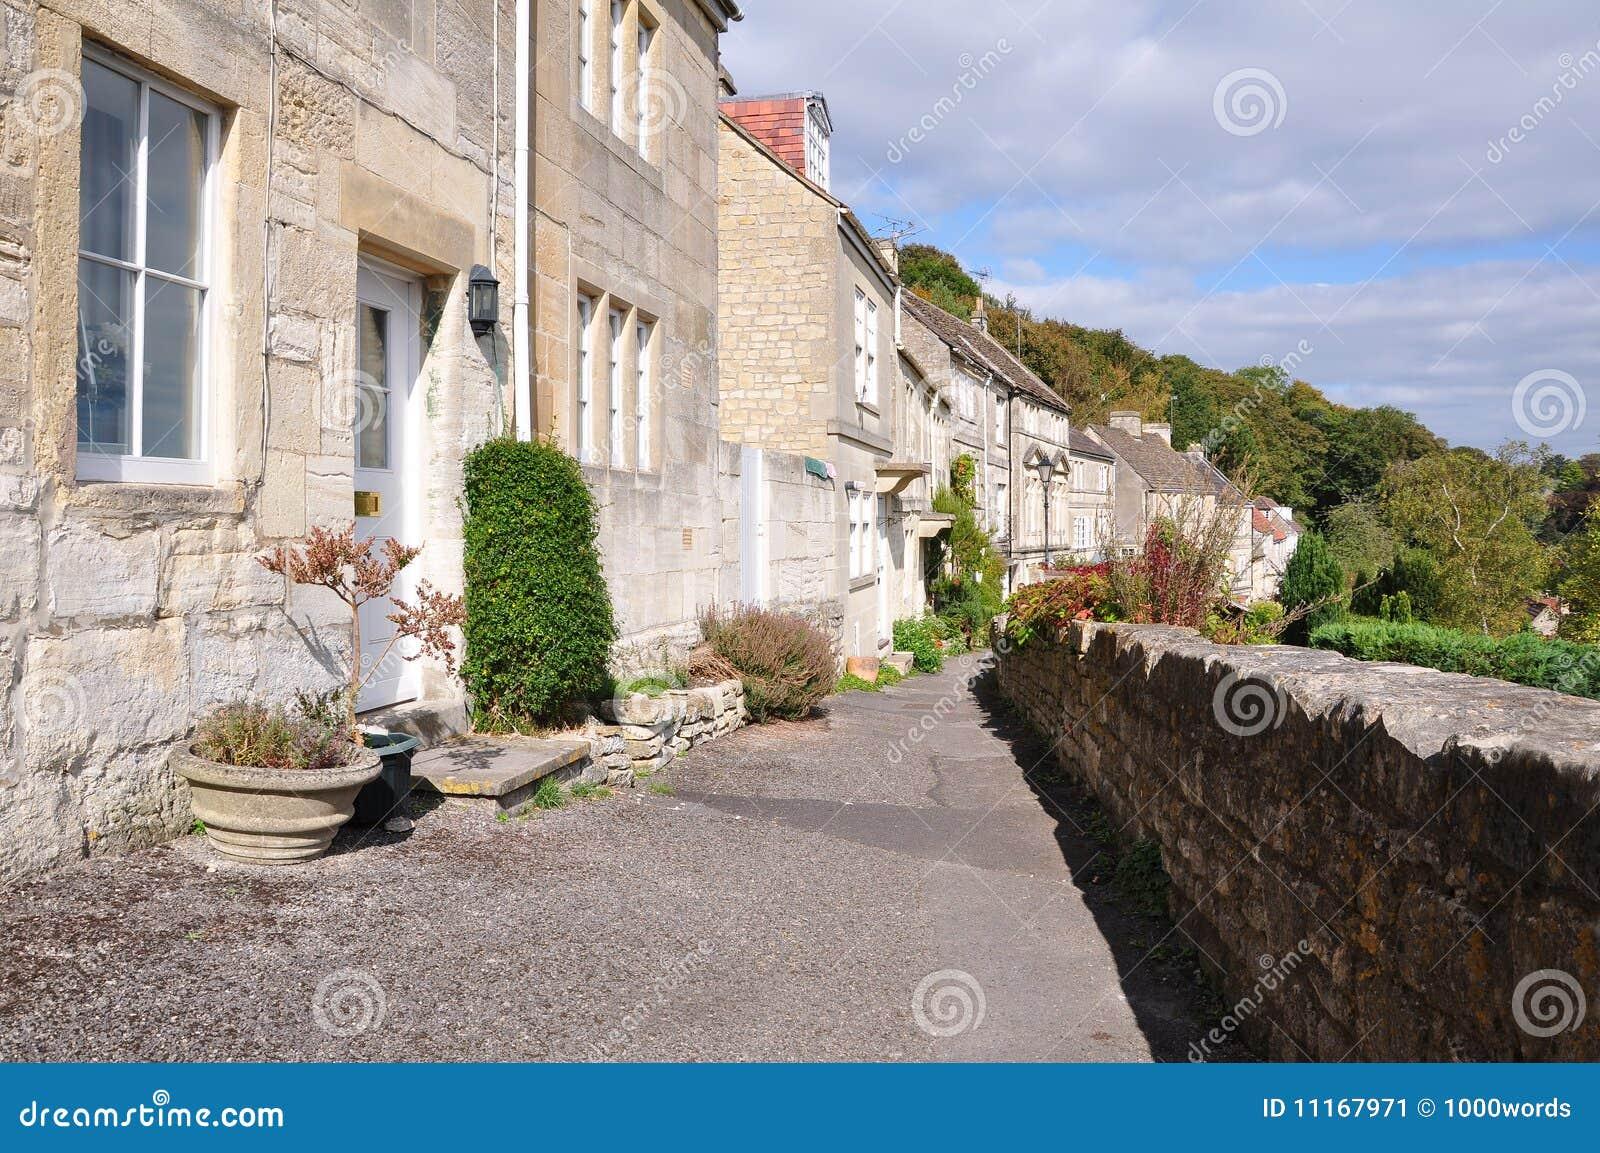 Terraced Houses